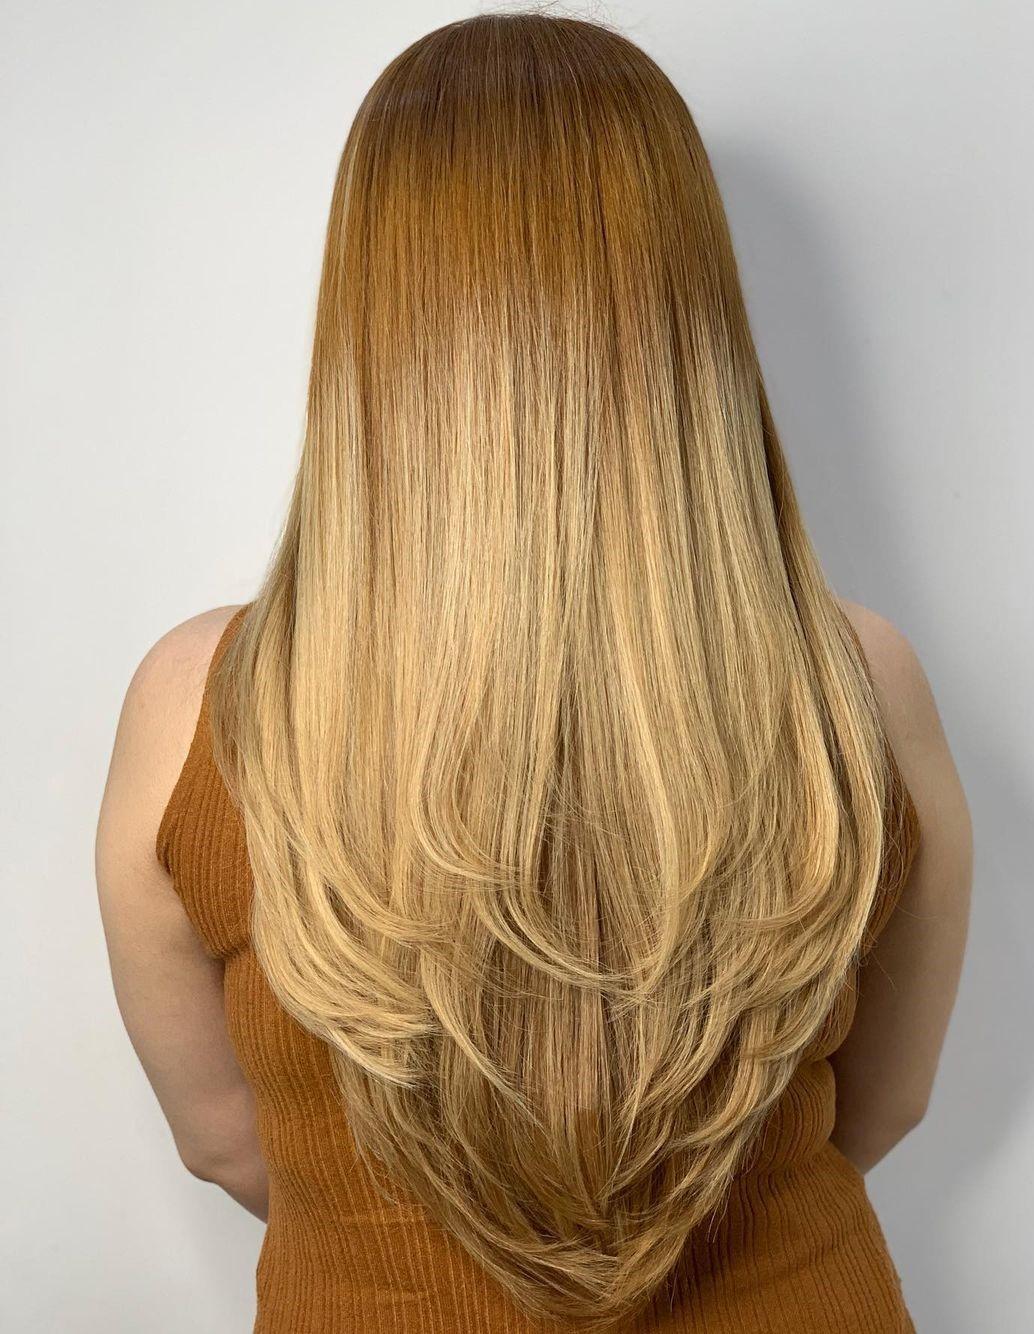 Golden Blonde Root Fade for V-Cut